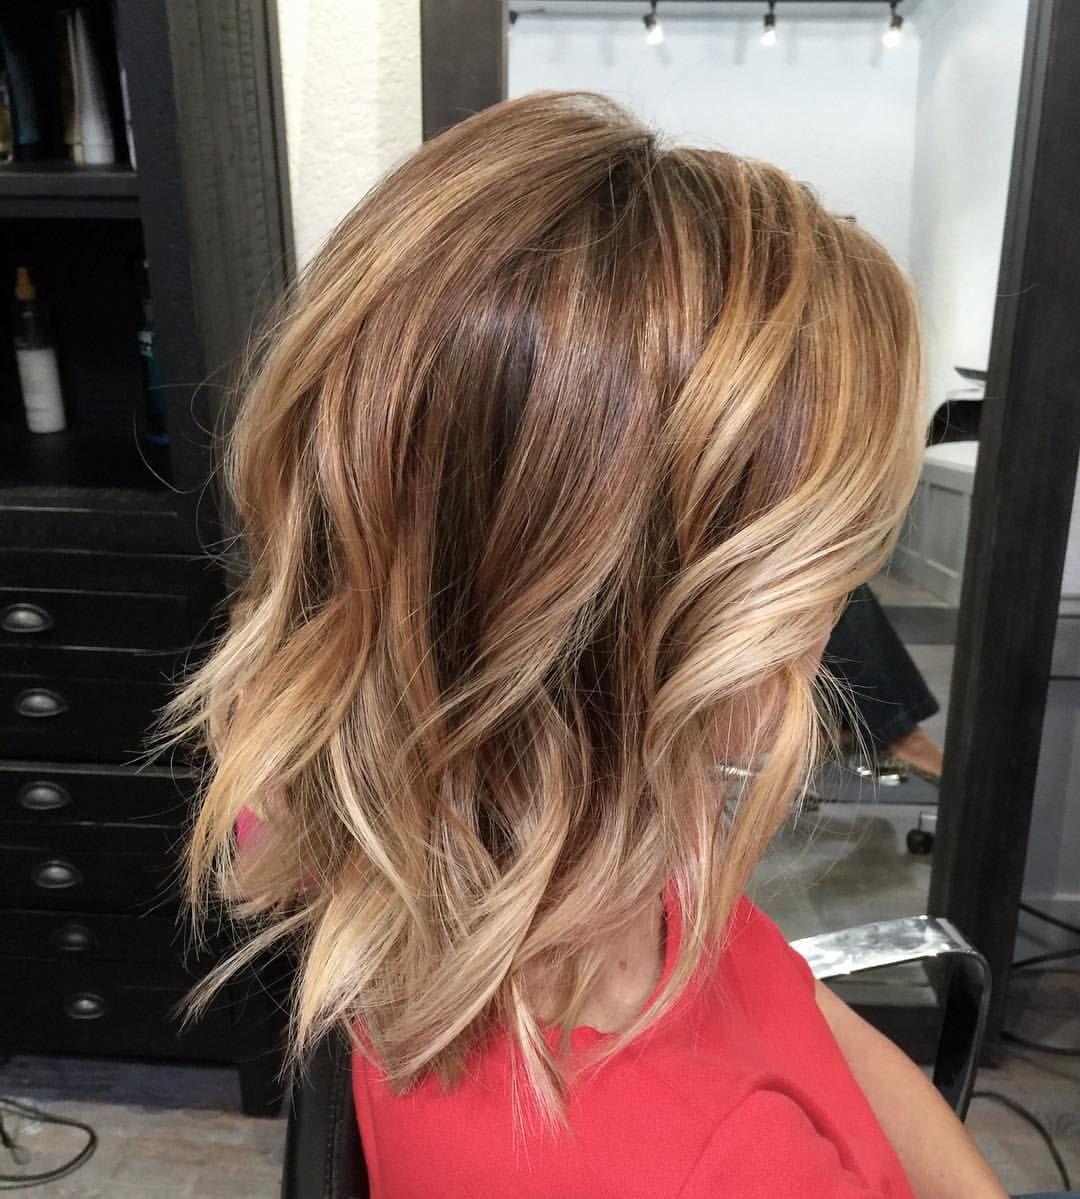 cute hairstyle - bronde bob